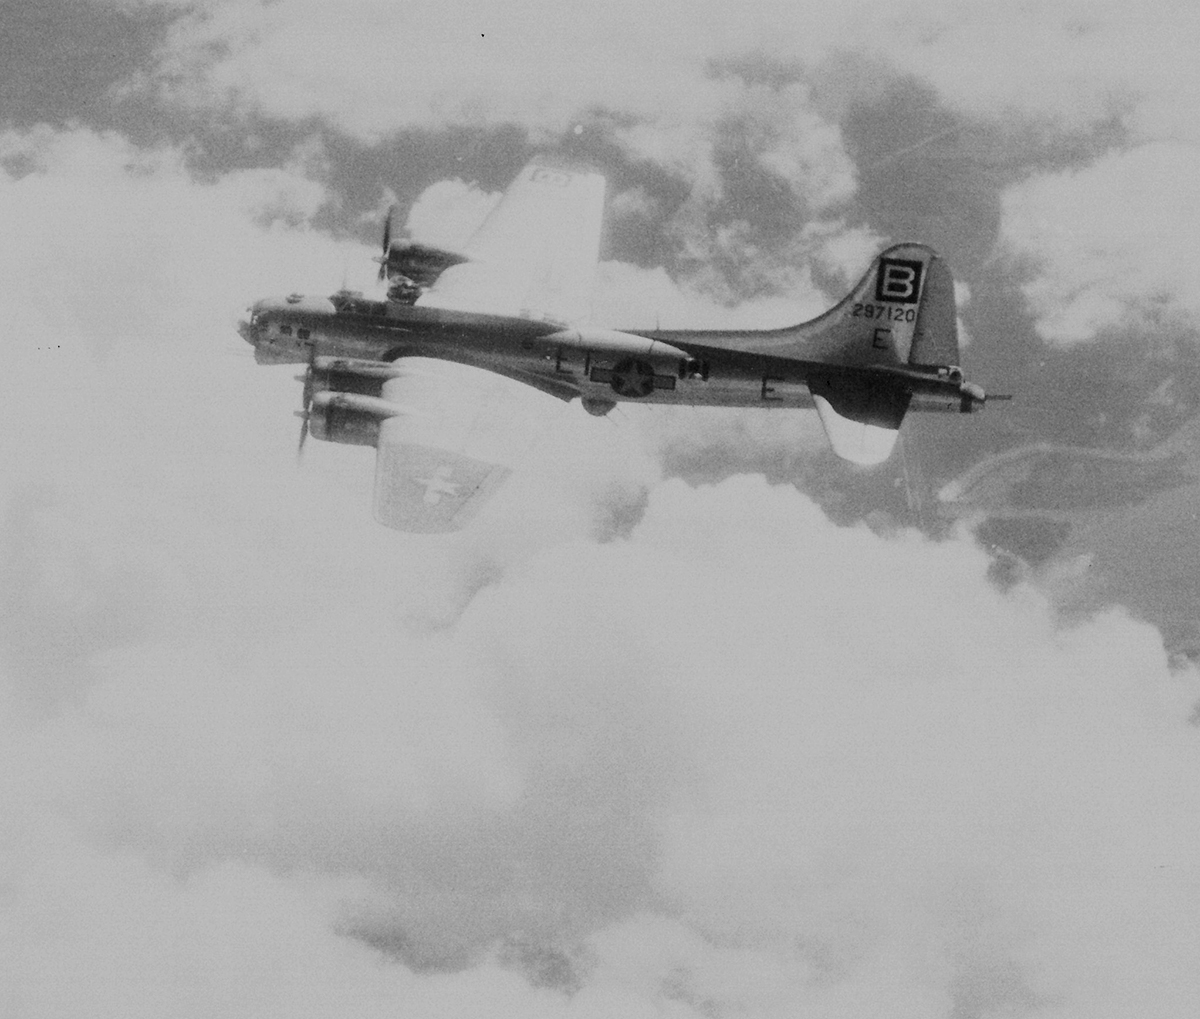 B-17 #42-97120